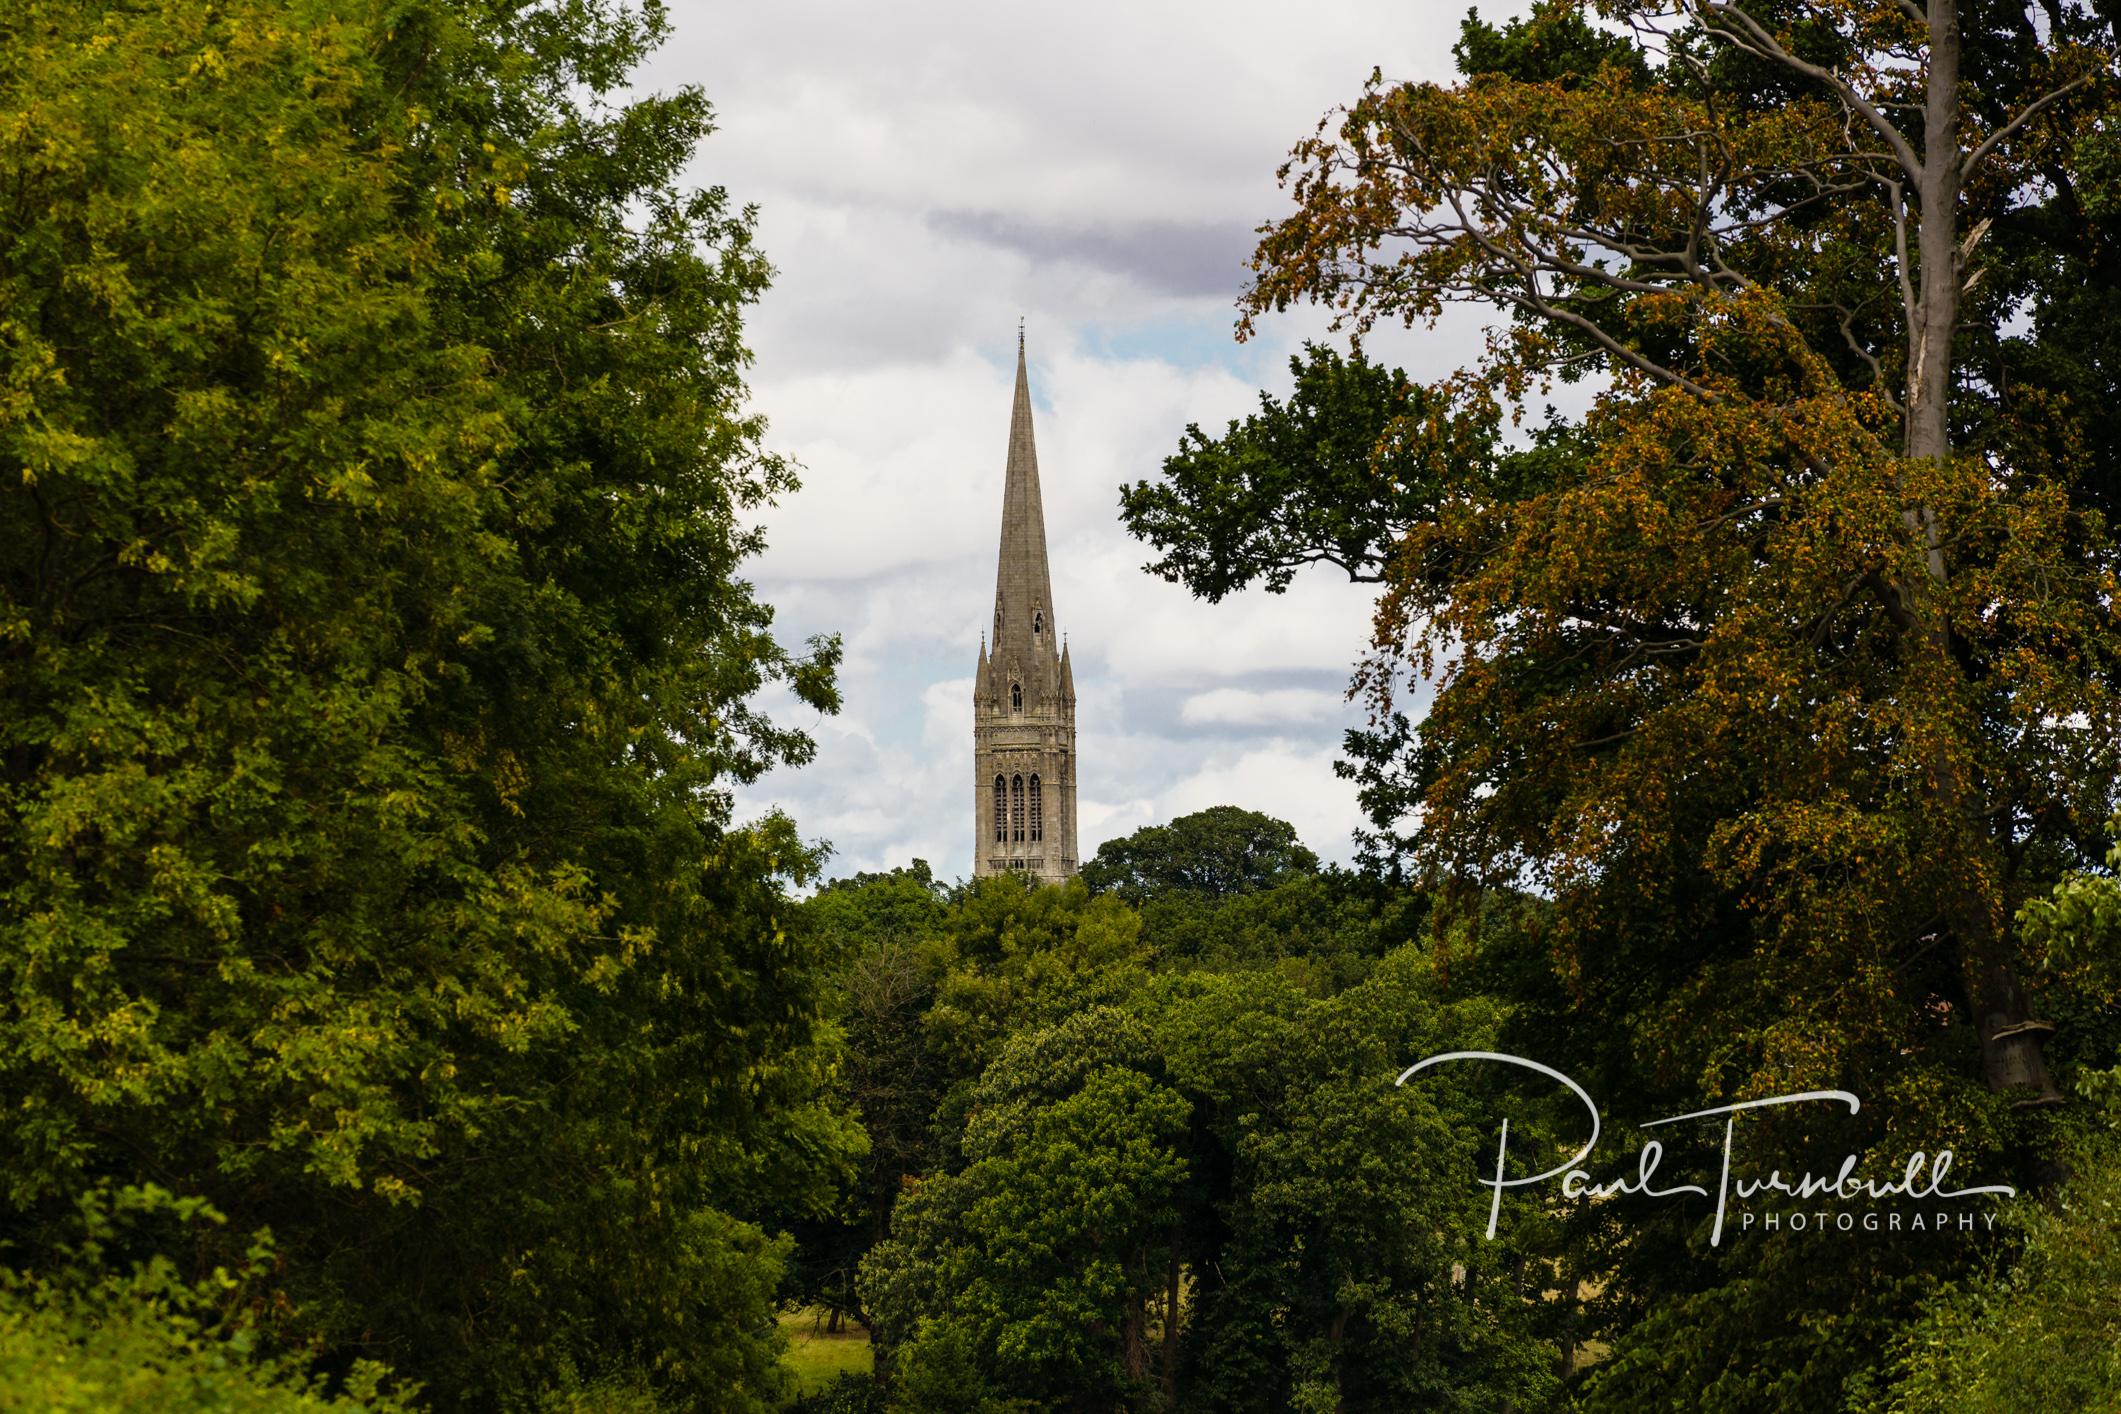 wedding-photographer-south-dalton-walkington-yorkshire-emma-james-027.jpg